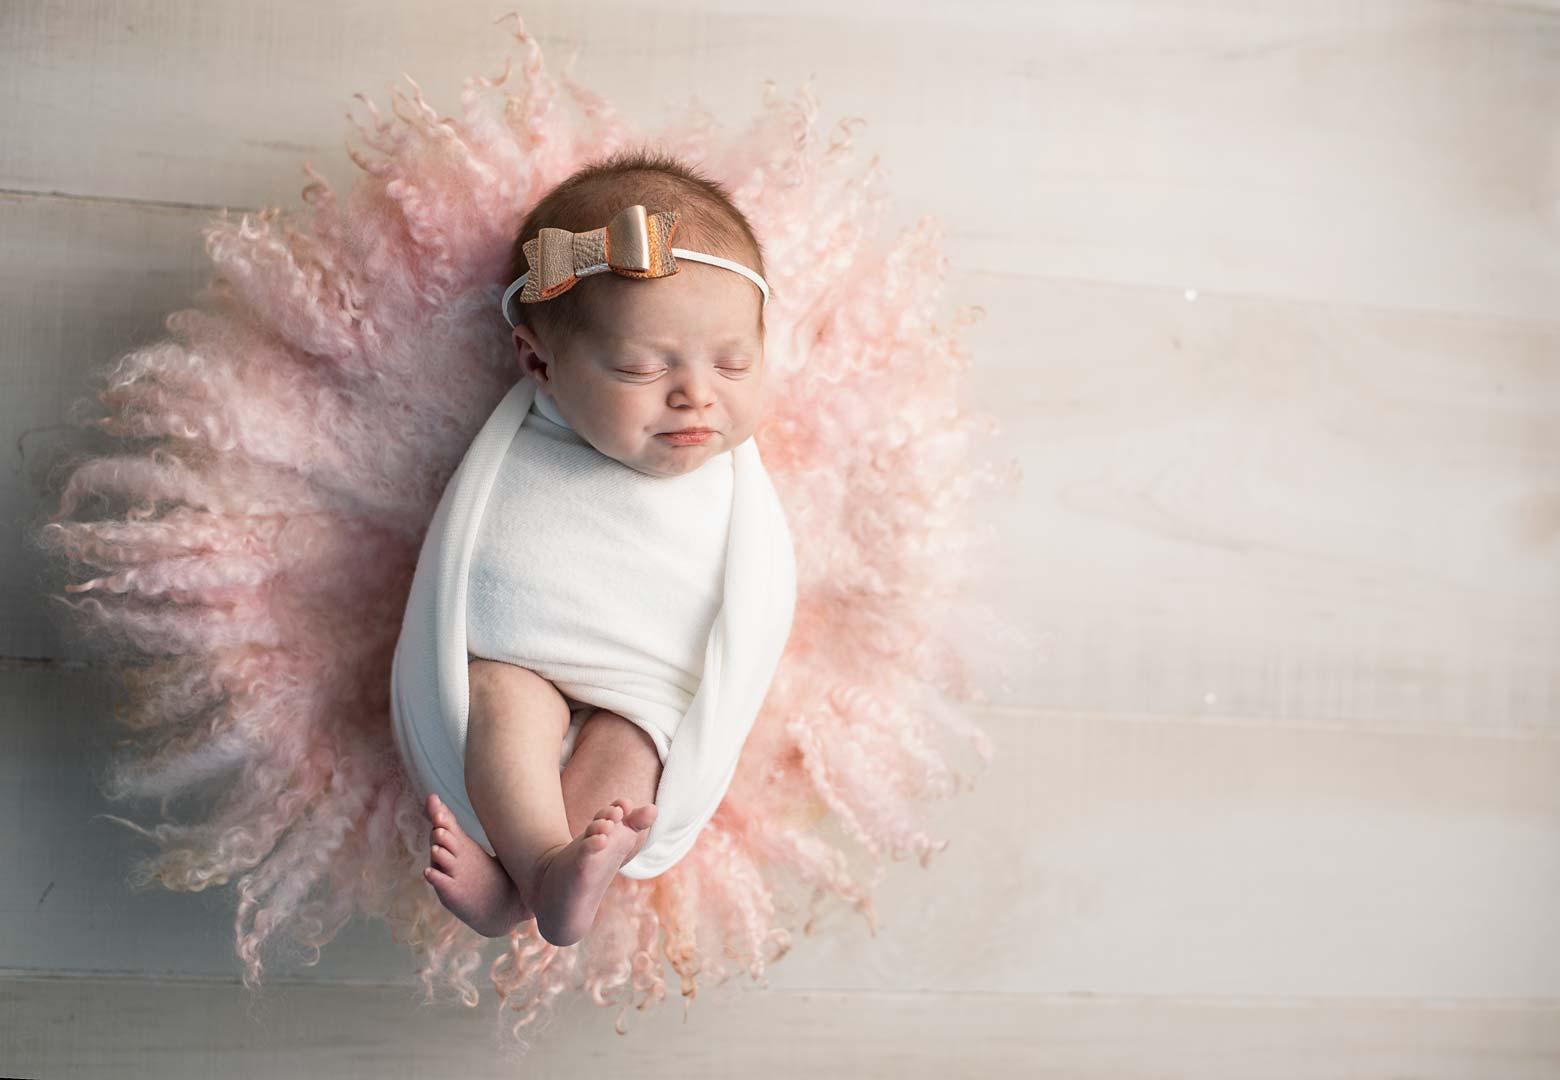 Newborn baby girl in pink